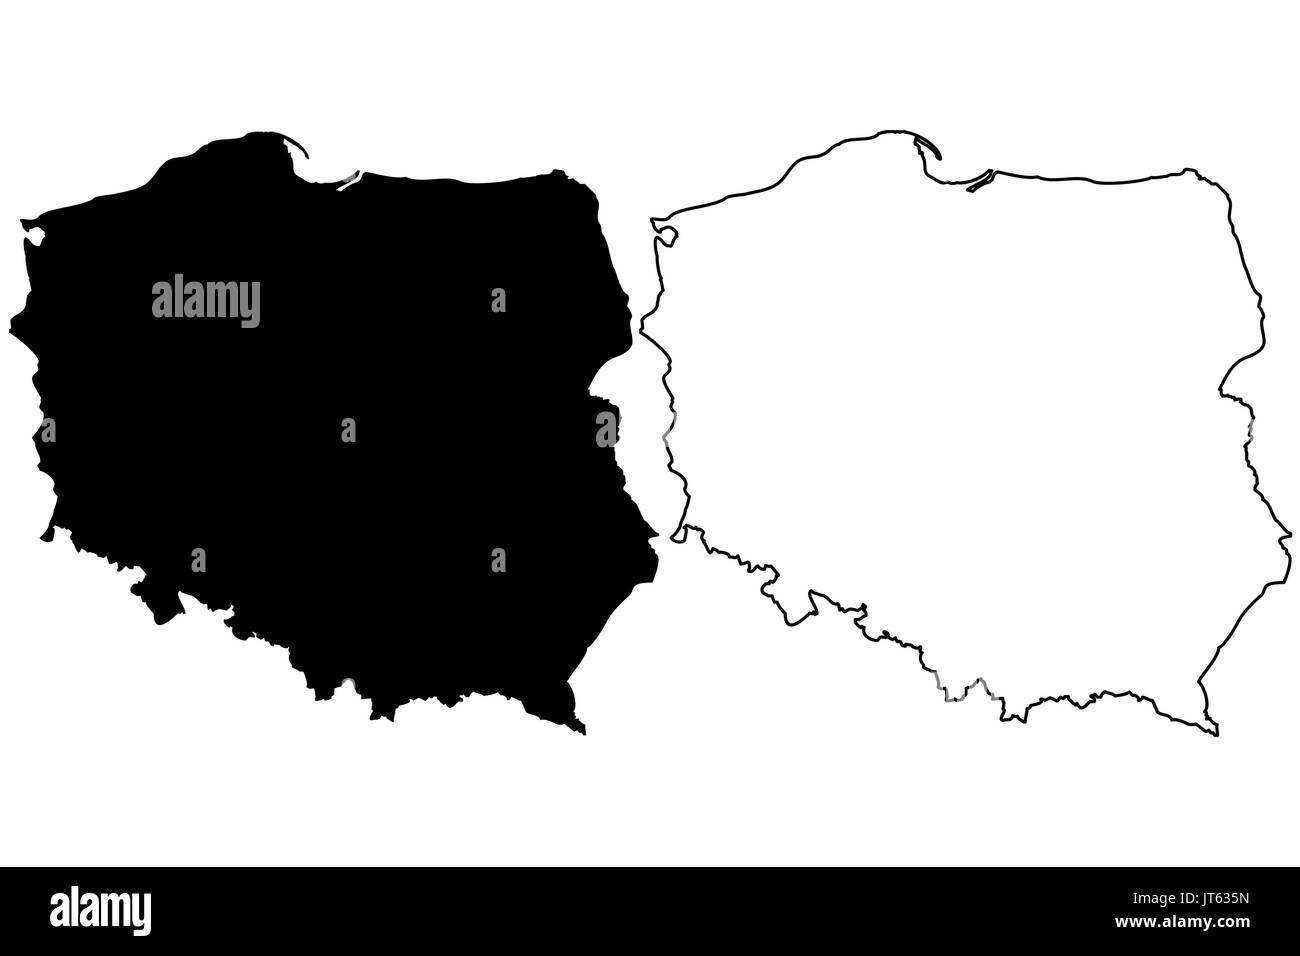 Polen Karte Umriss.Polen Karte Vektor Illustration Freihand Skizze Polen Vektor